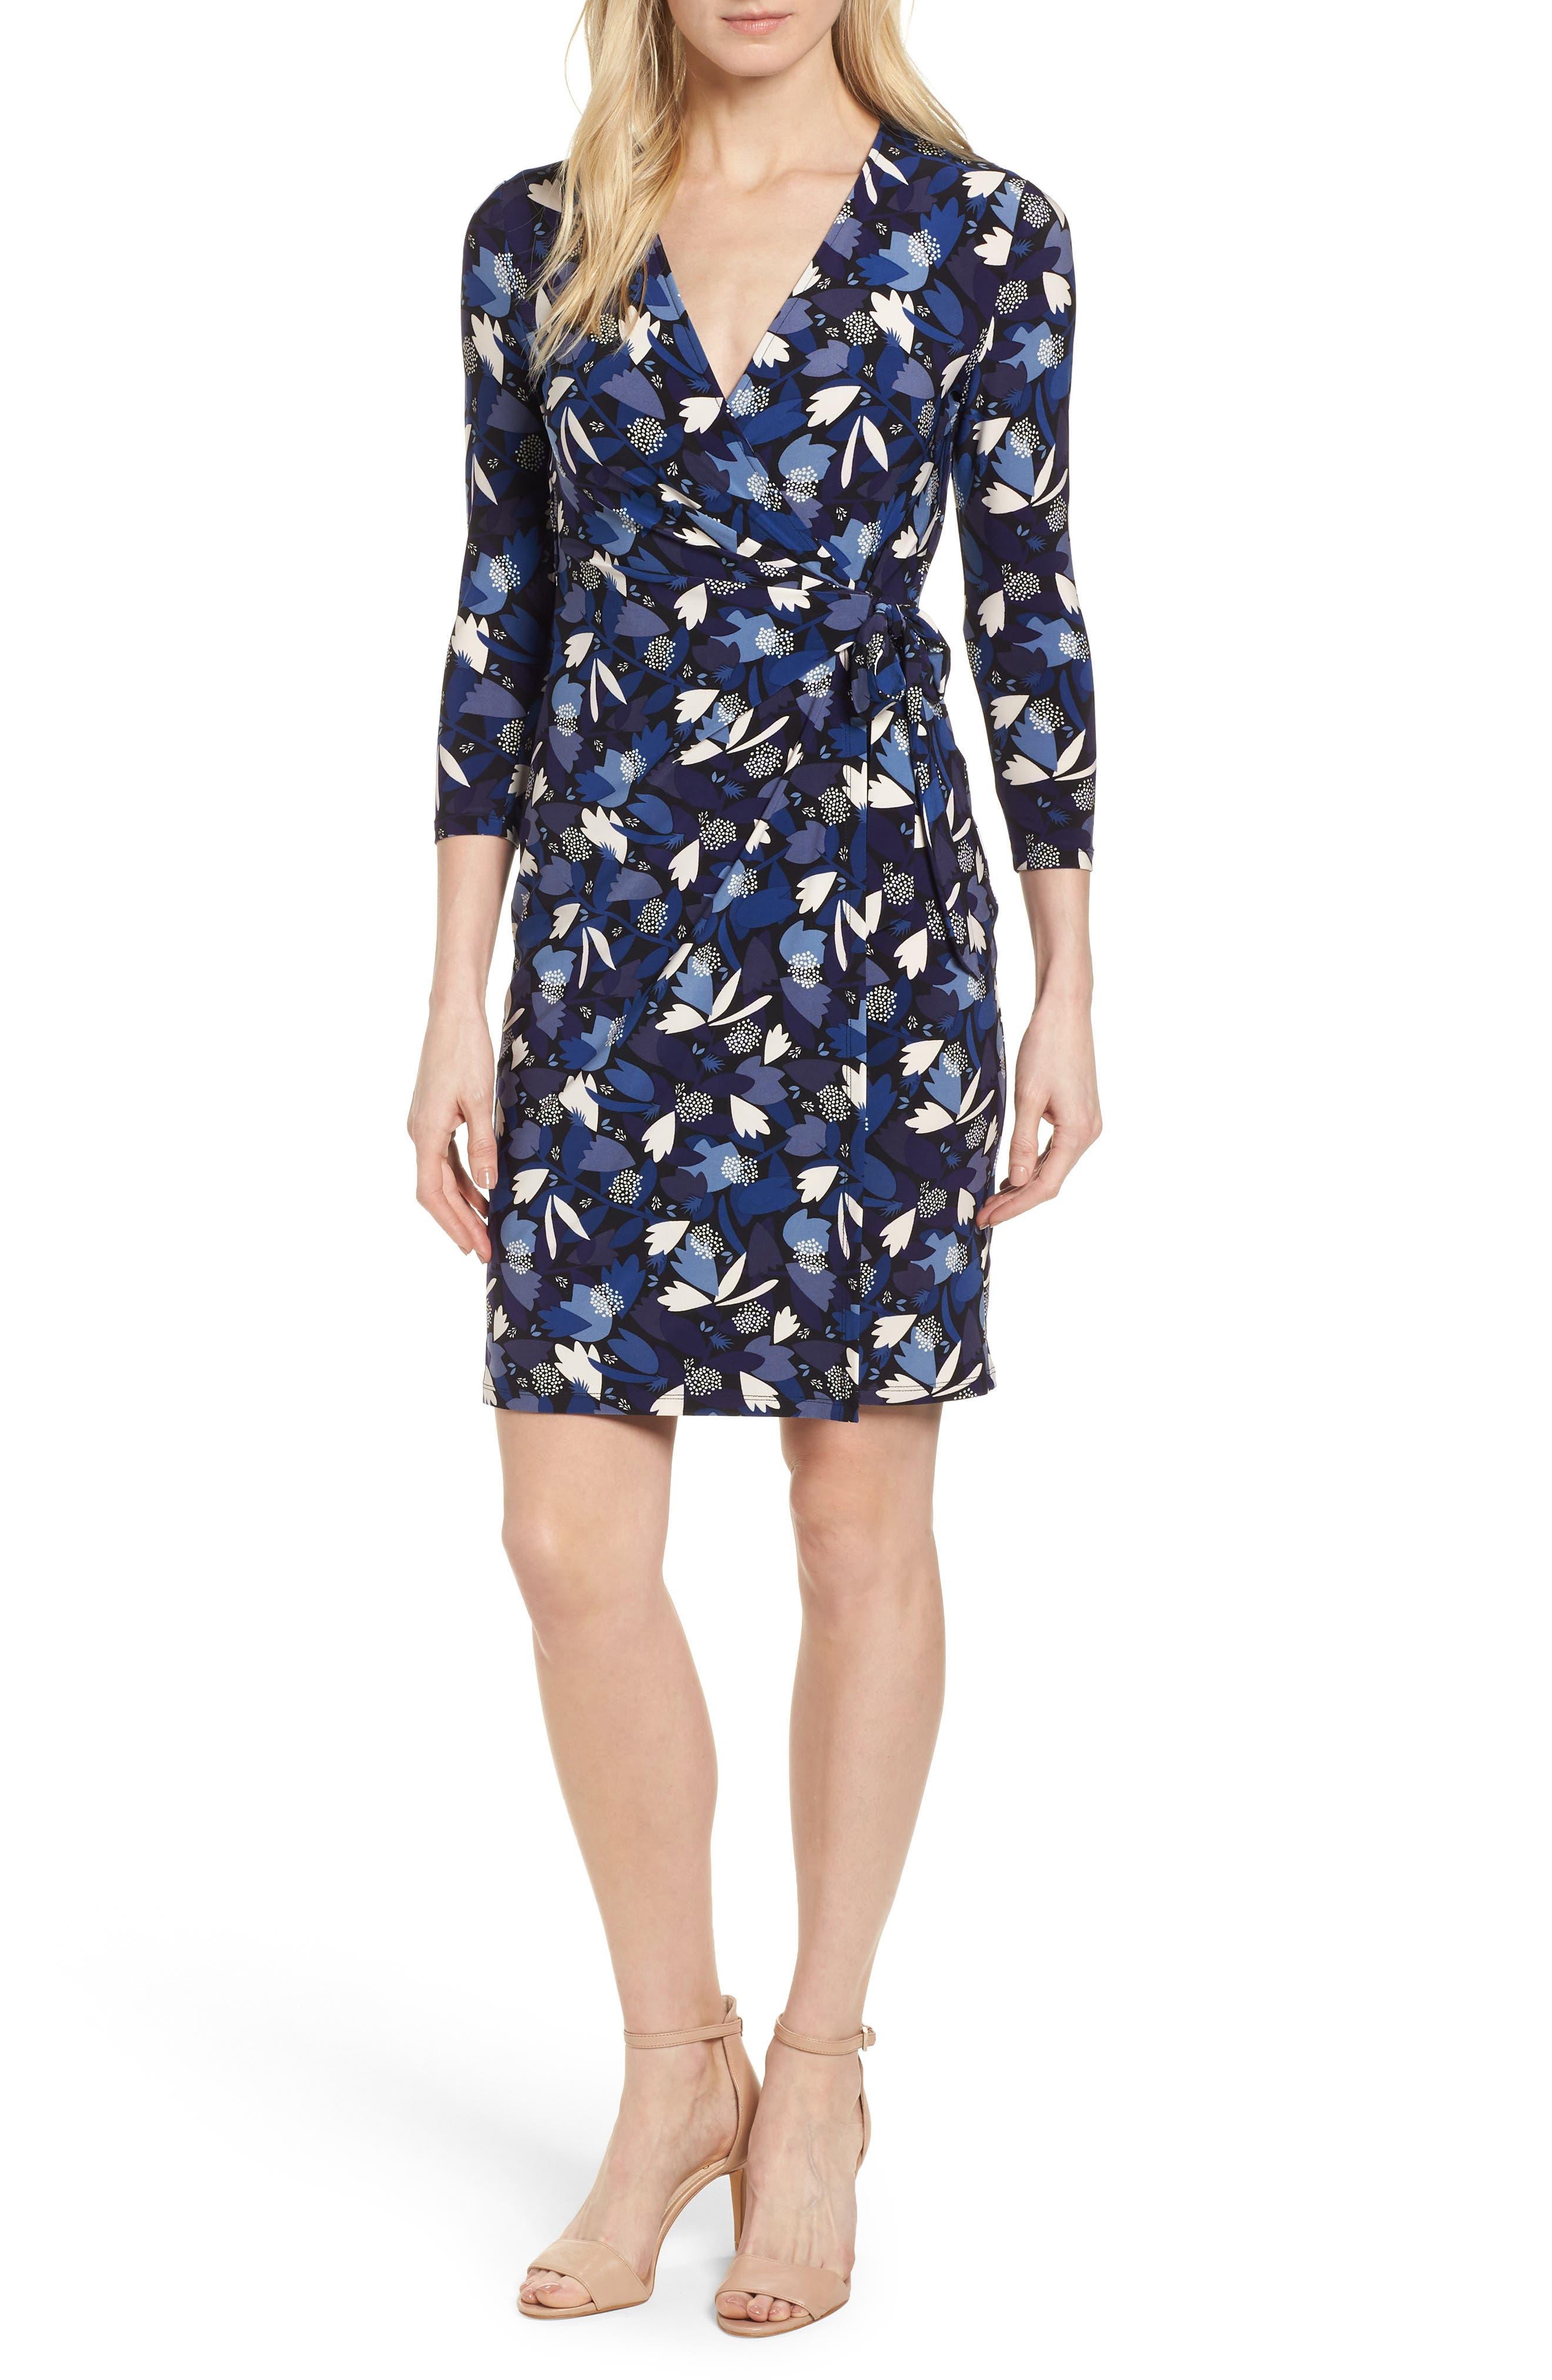 New York Amalfi Print Classic Wrap Dress,                             Main thumbnail 1, color,                             Black/ Monaco Combo